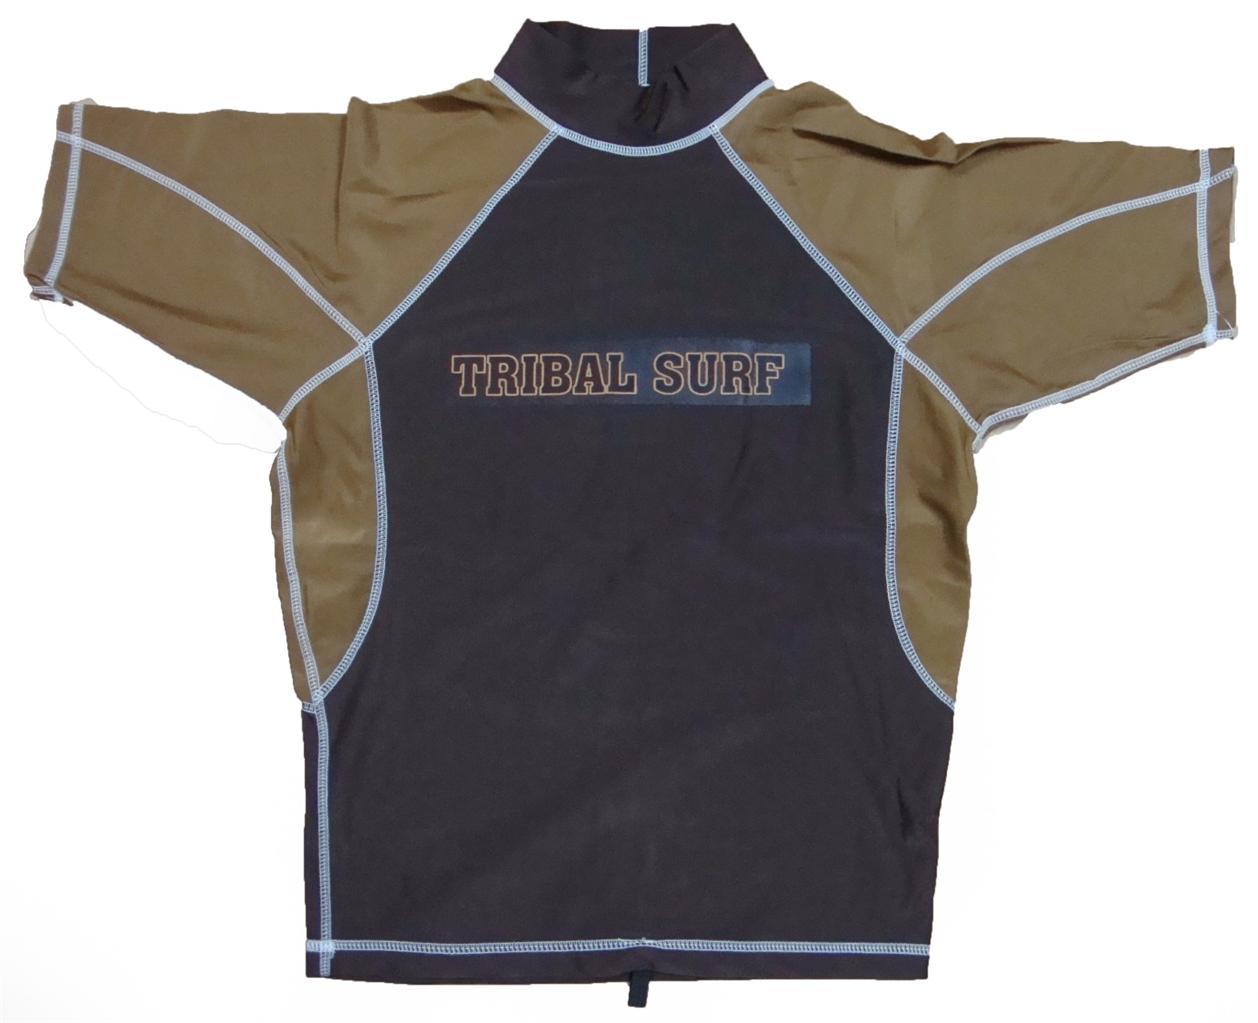 Mens spf 50 surf shirt rash guard short sleeve small thru for Shirts with sunscreen in them